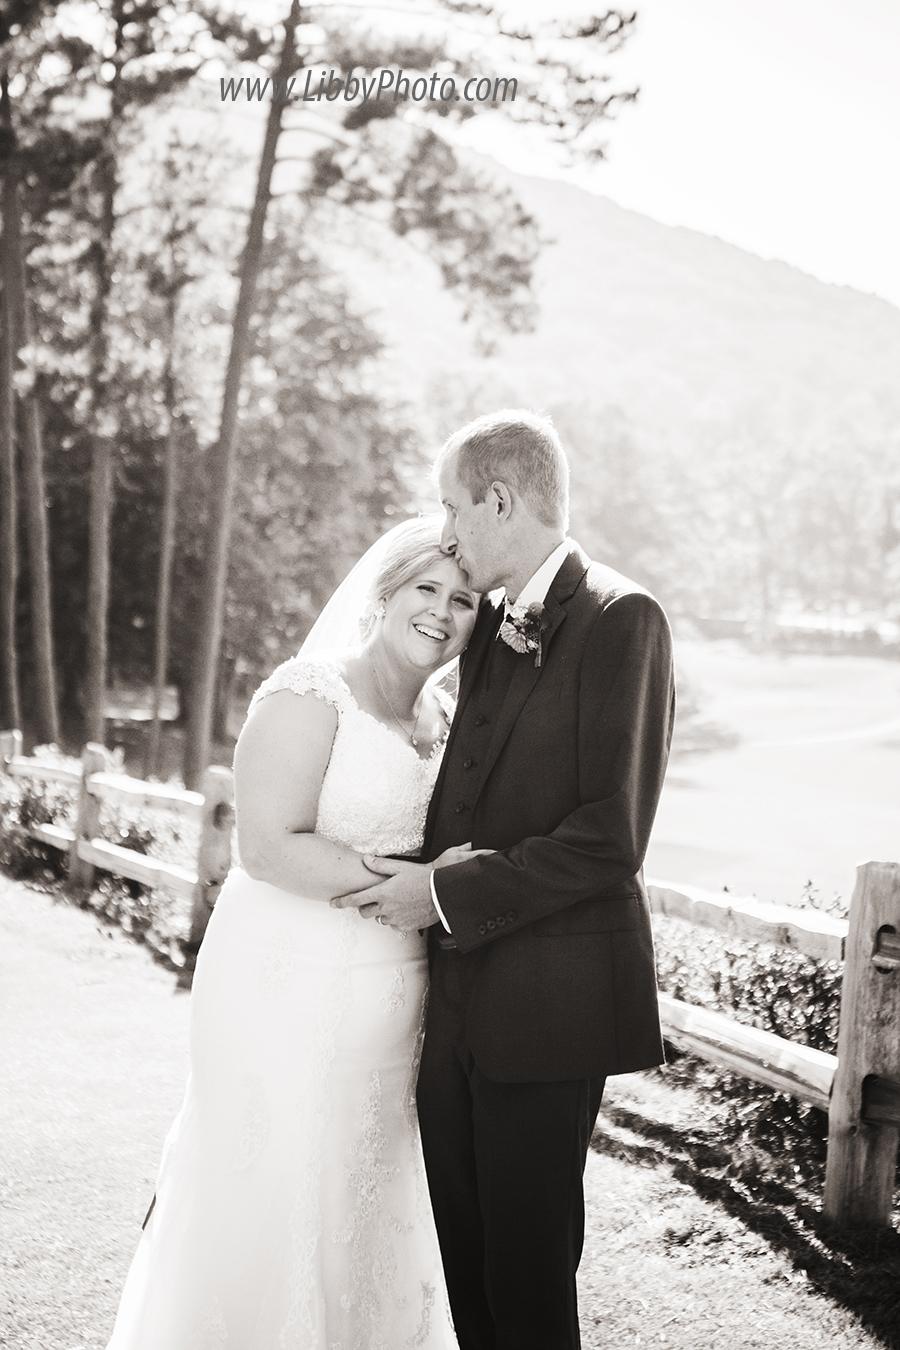 Atlanta wedding photography, Libbyphoto11 (12).jpg